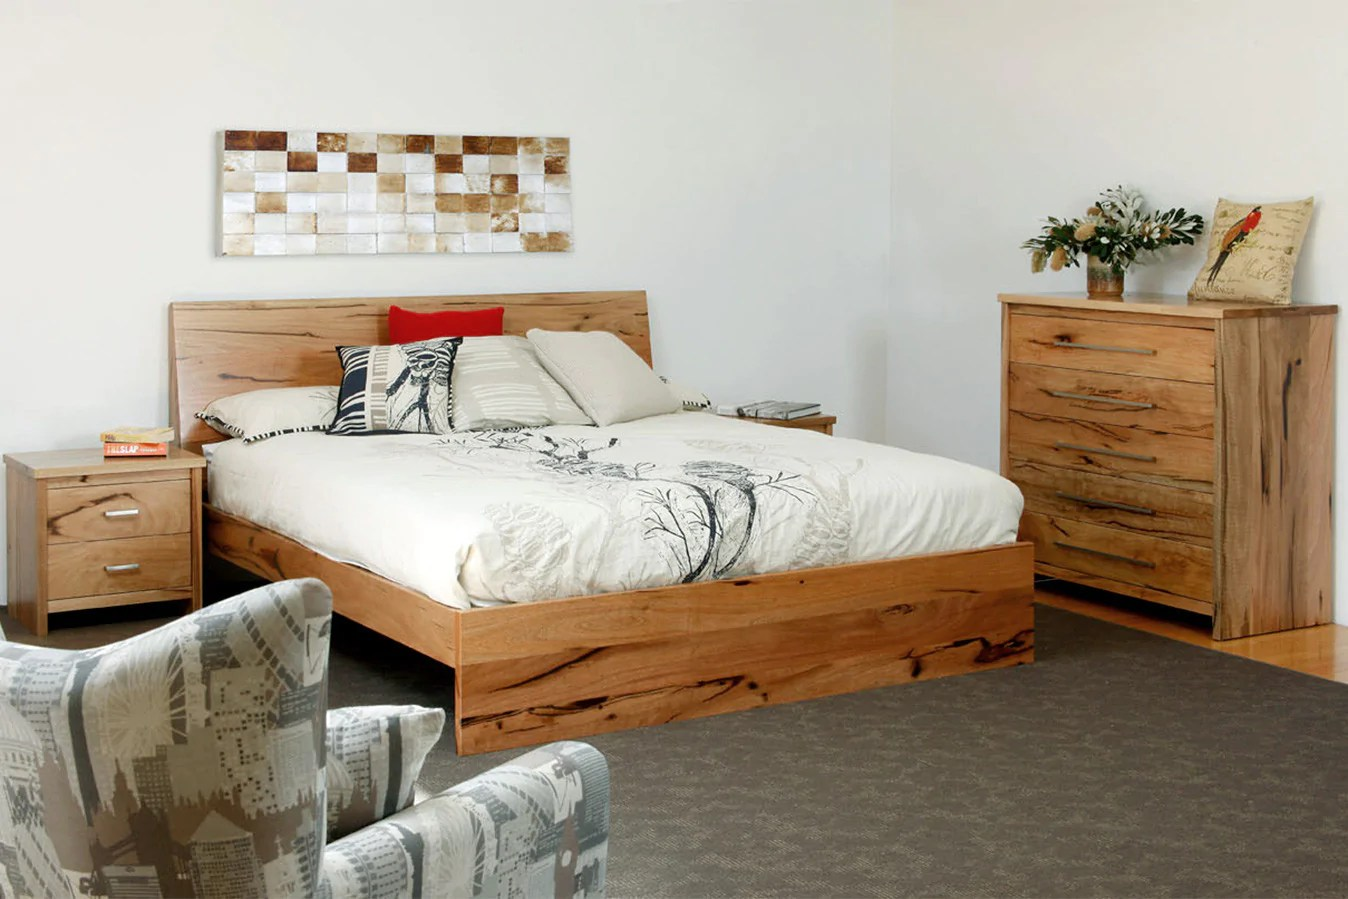 bedroom chair perth wa la z boy lift controller boranup solid marri furniture suite timber bed